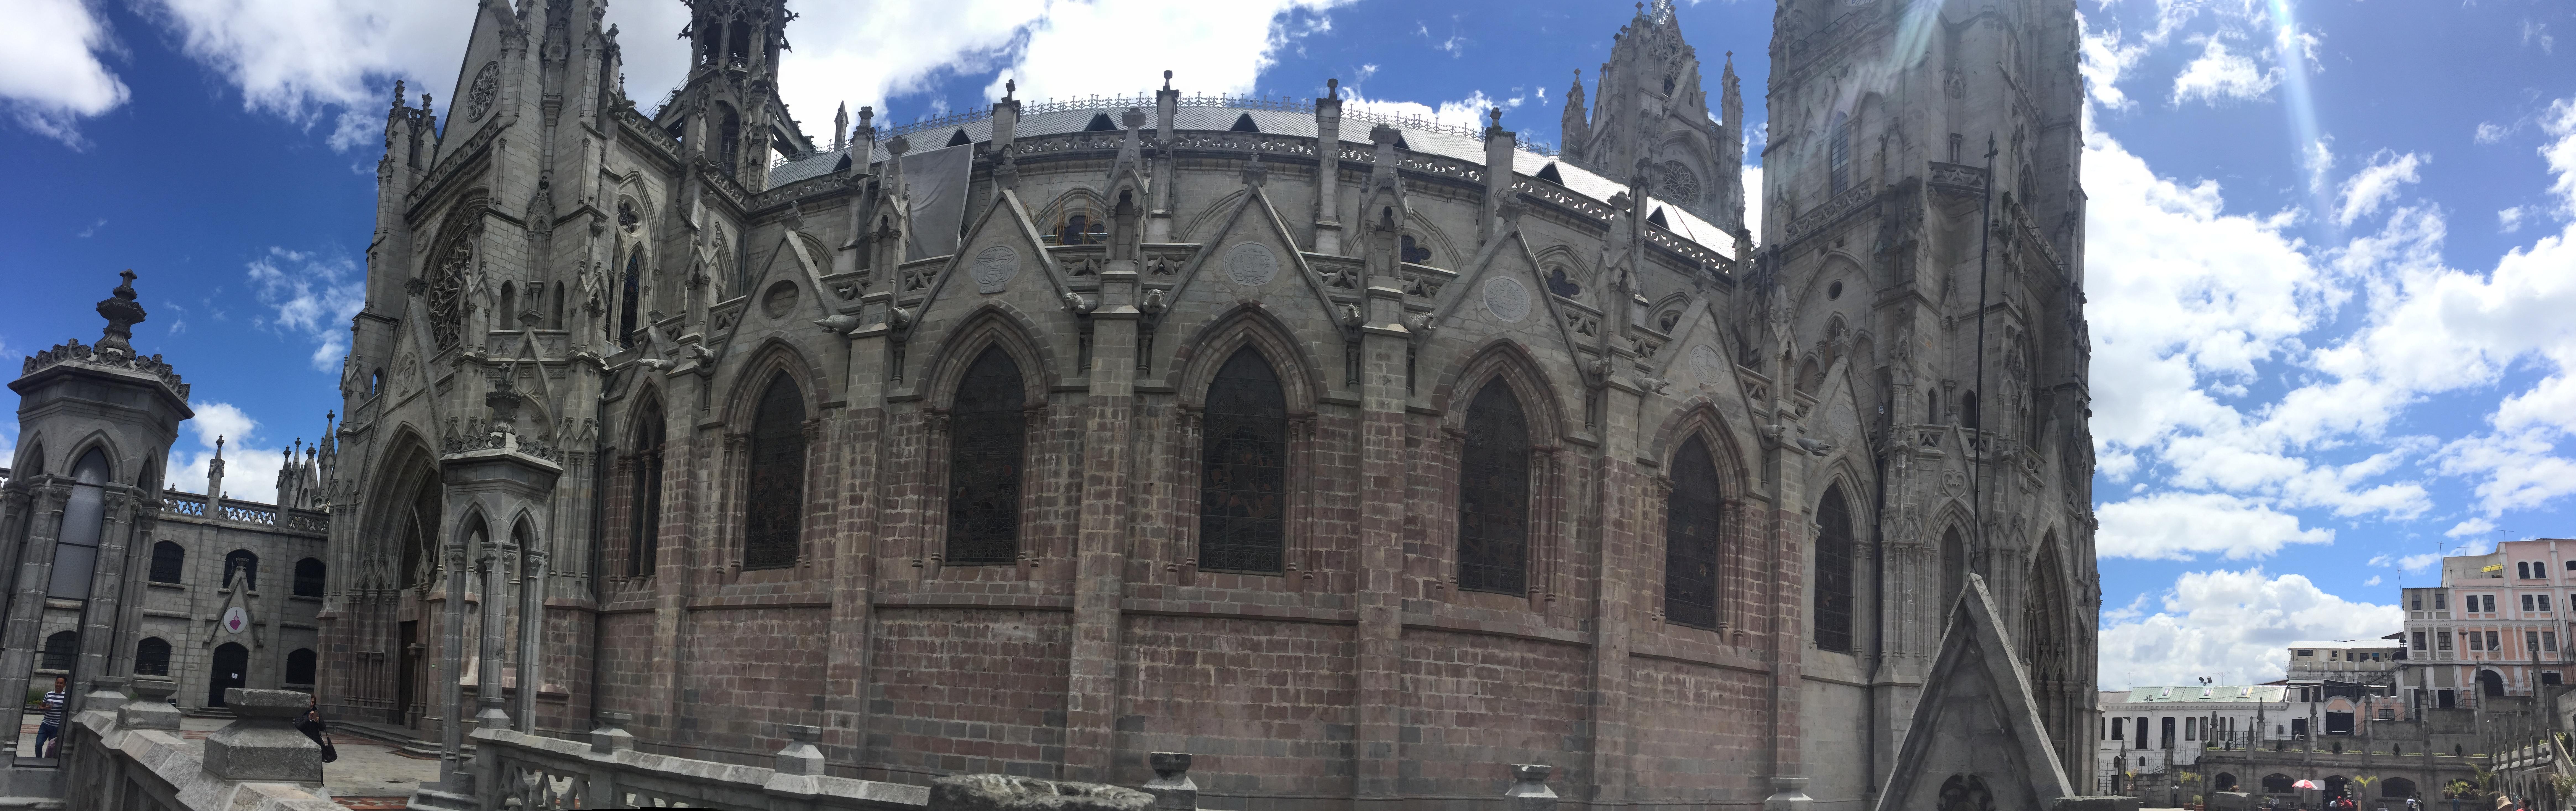 basilica panorama.JPG